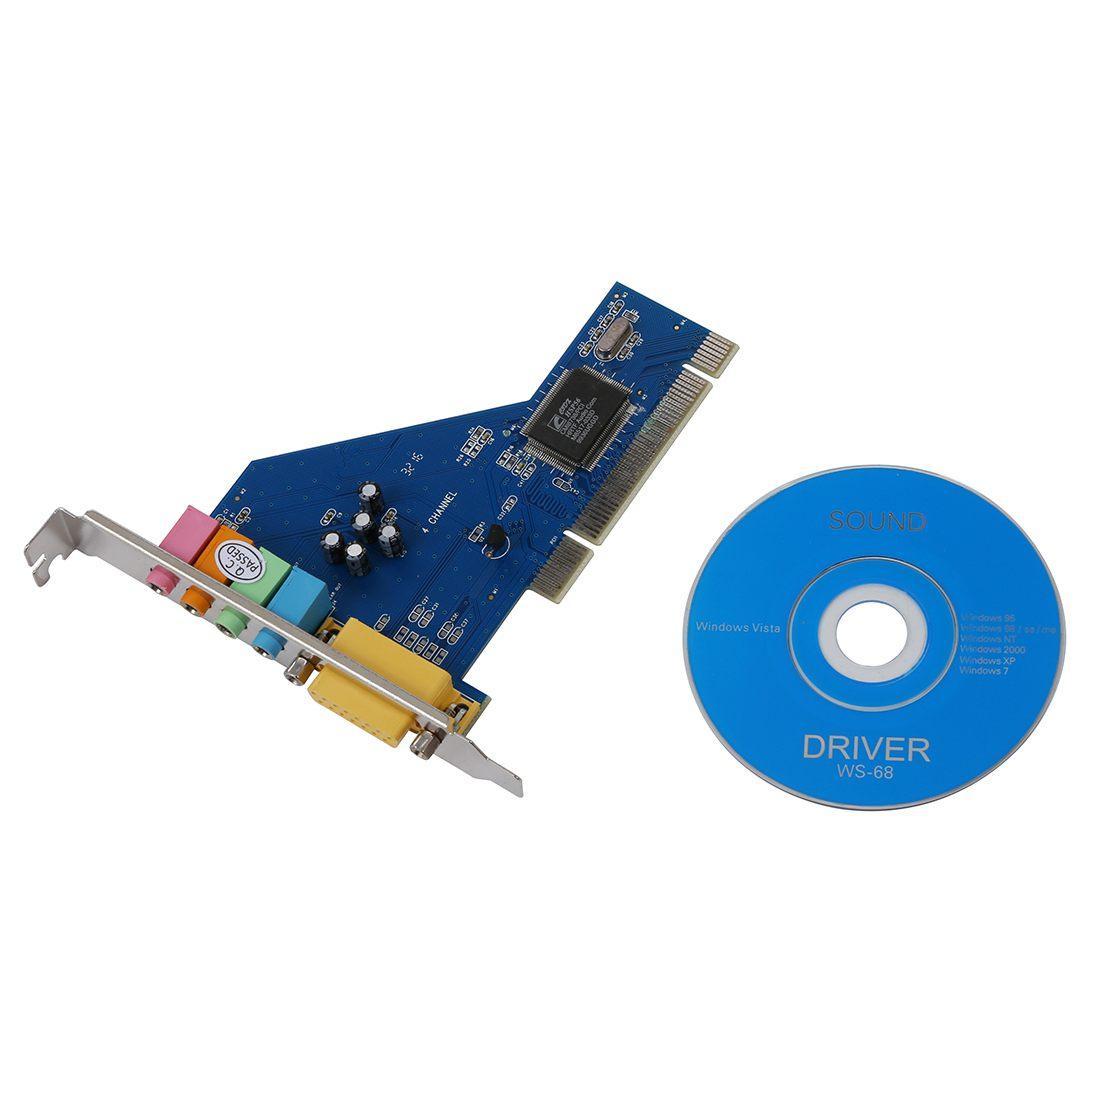 Внутренняя Звуковая карта PCI - 4CH (c-media 8738), 3D 4.1, 4 канала